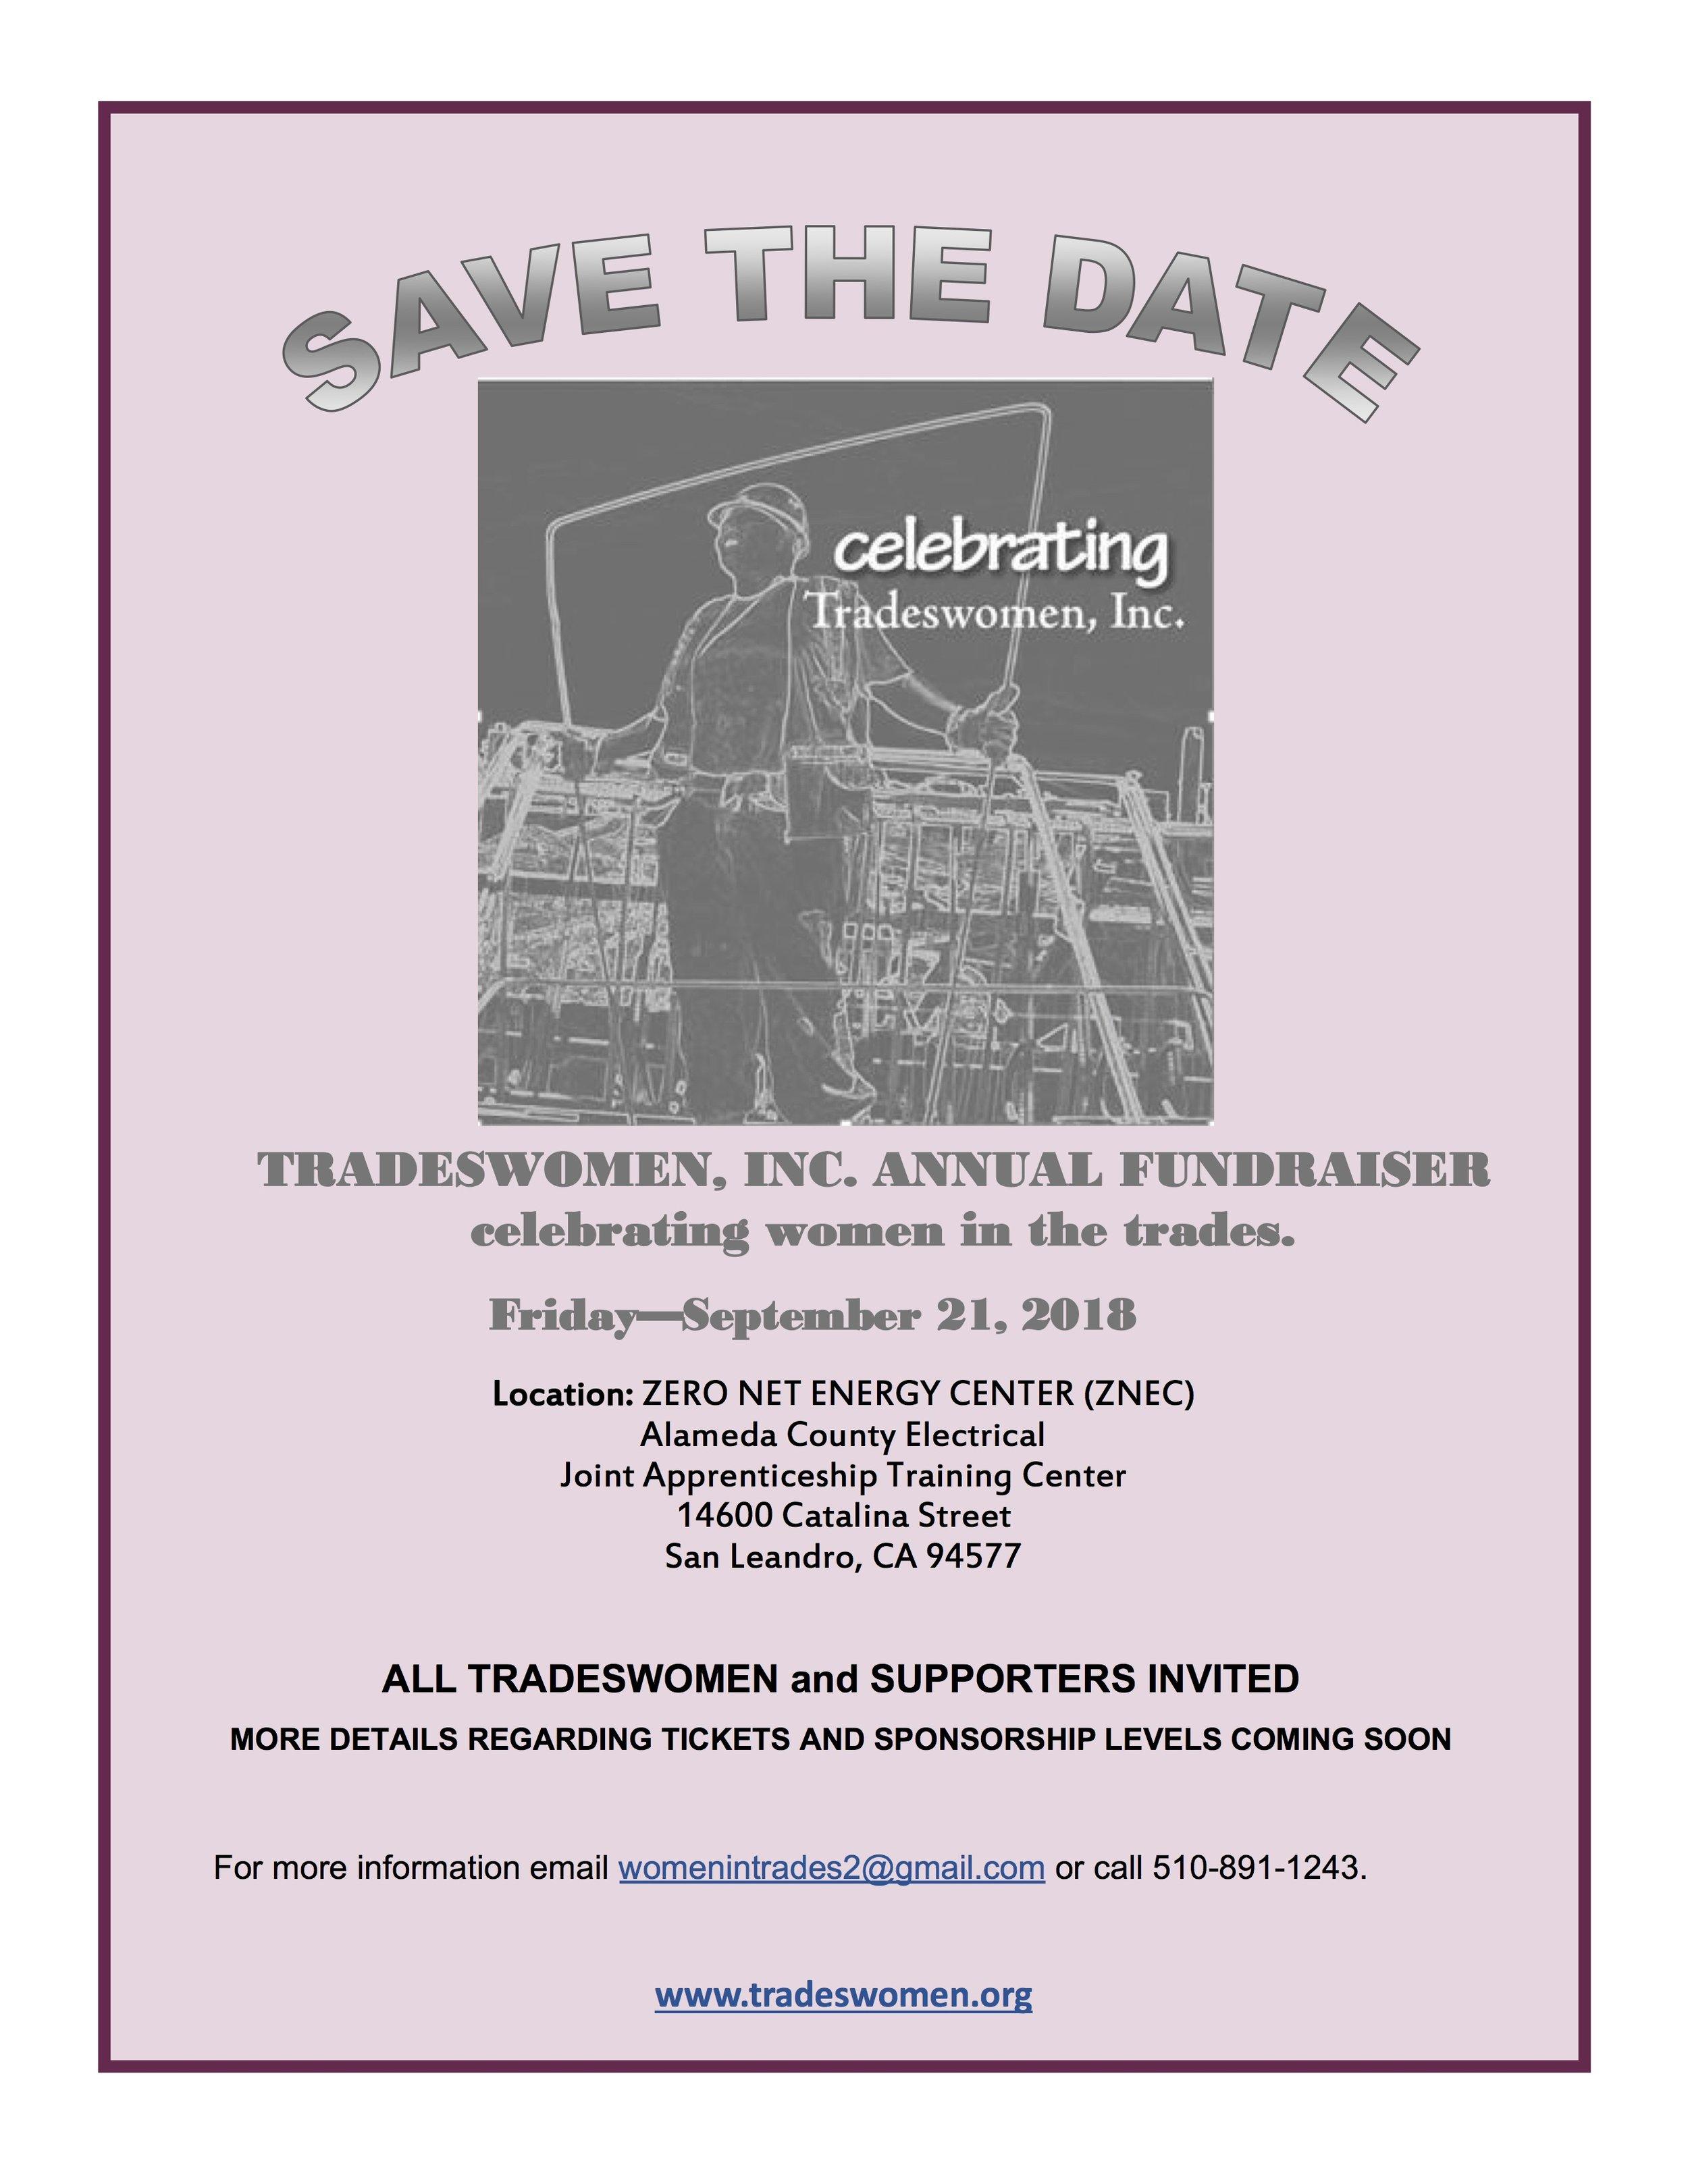 Tradeswomen Fundraiser_Save the Date51118.jpg